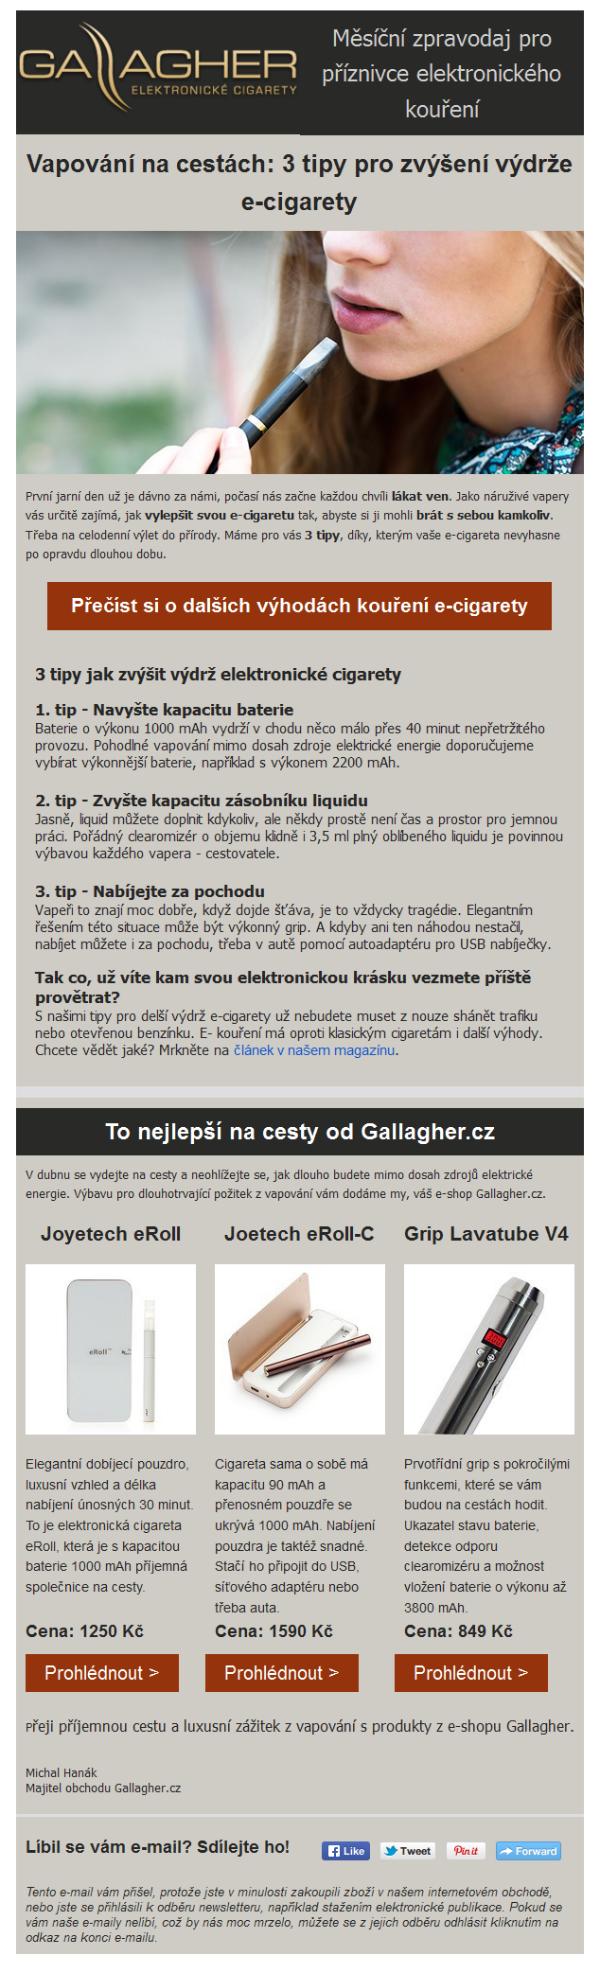 E-mail-gallagher